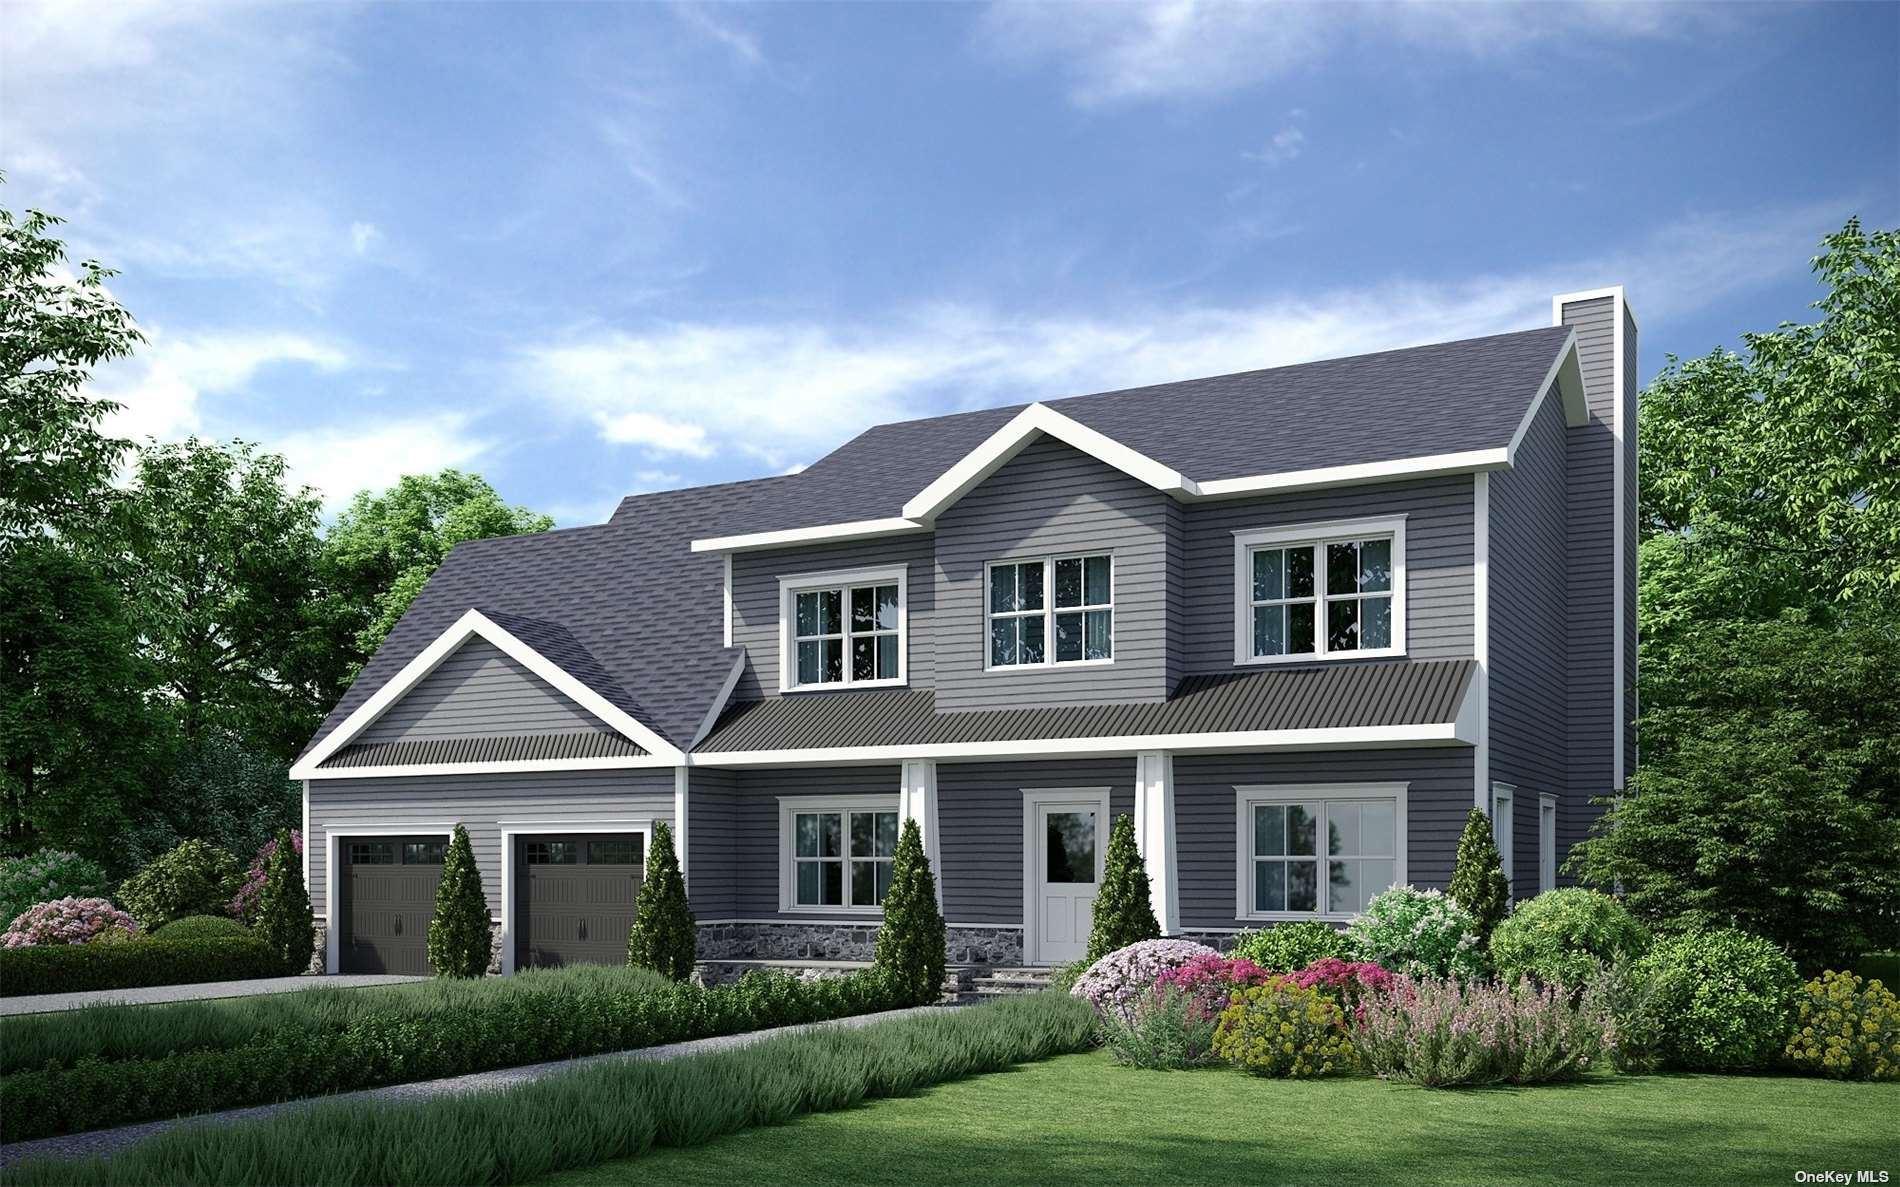 Lot 5 Wading River Hol Road, Ridge, NY 11961 - MLS#: 3336500